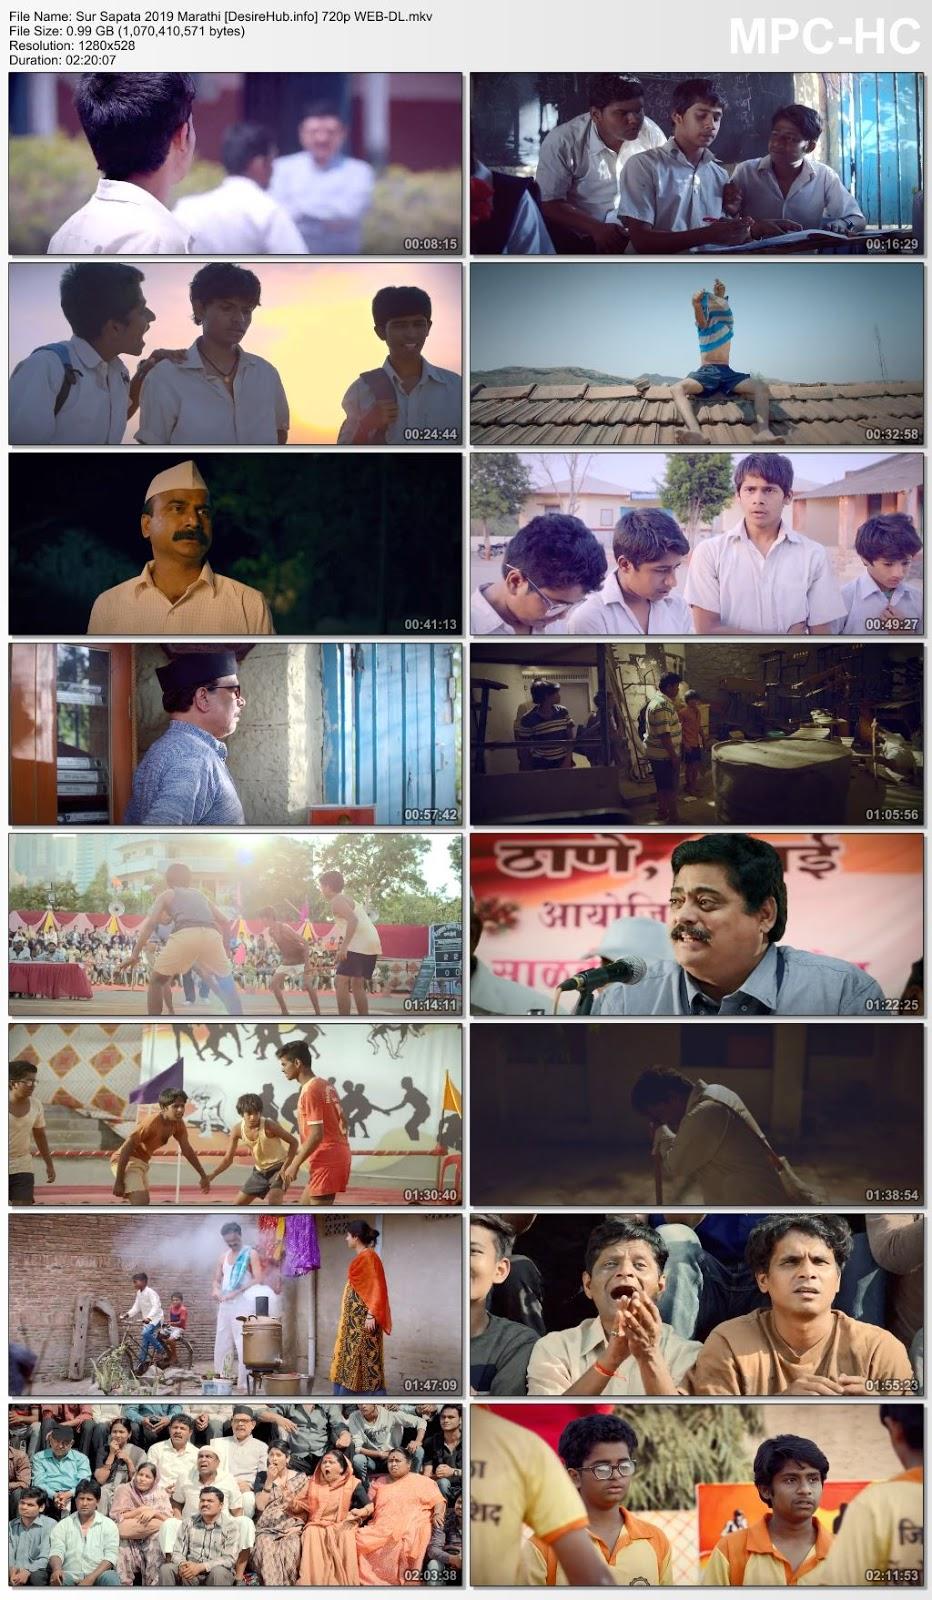 Sur Sapata 2019 Marathi 480p WEB-DL 400MB Desirehub